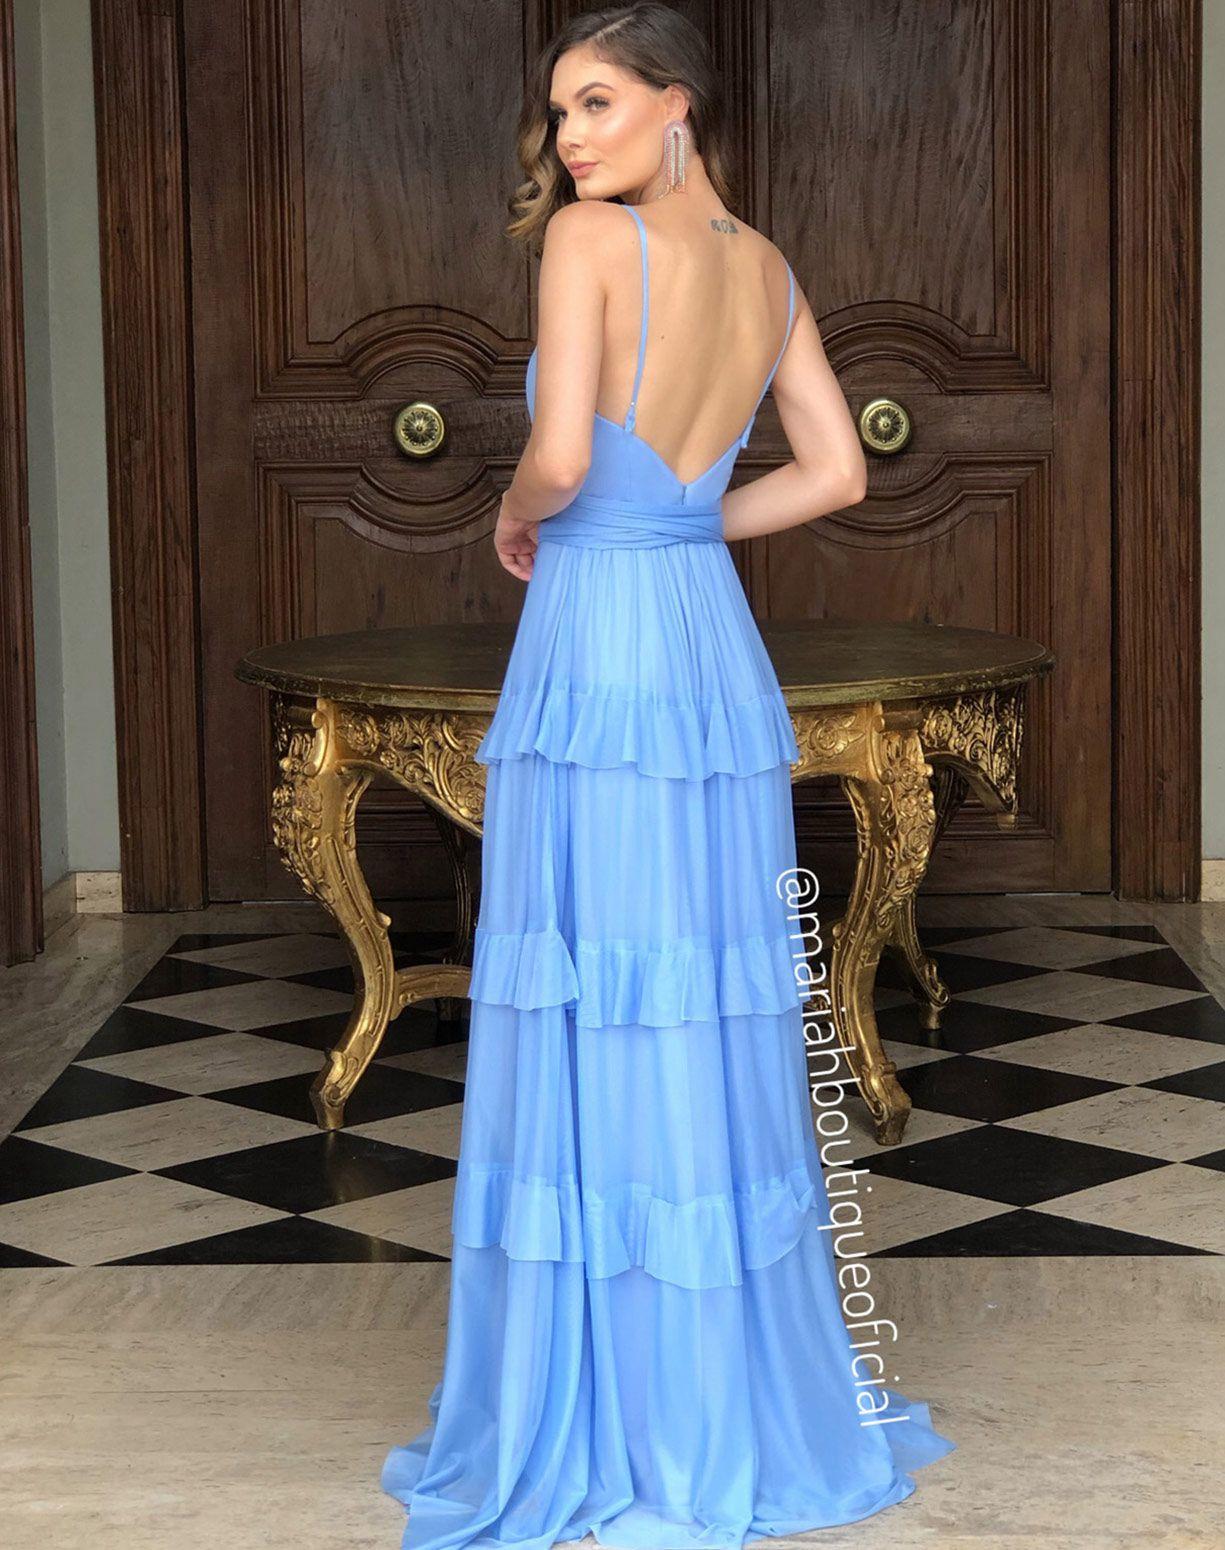 Vestido Azul Serenity em Camadas de Tule